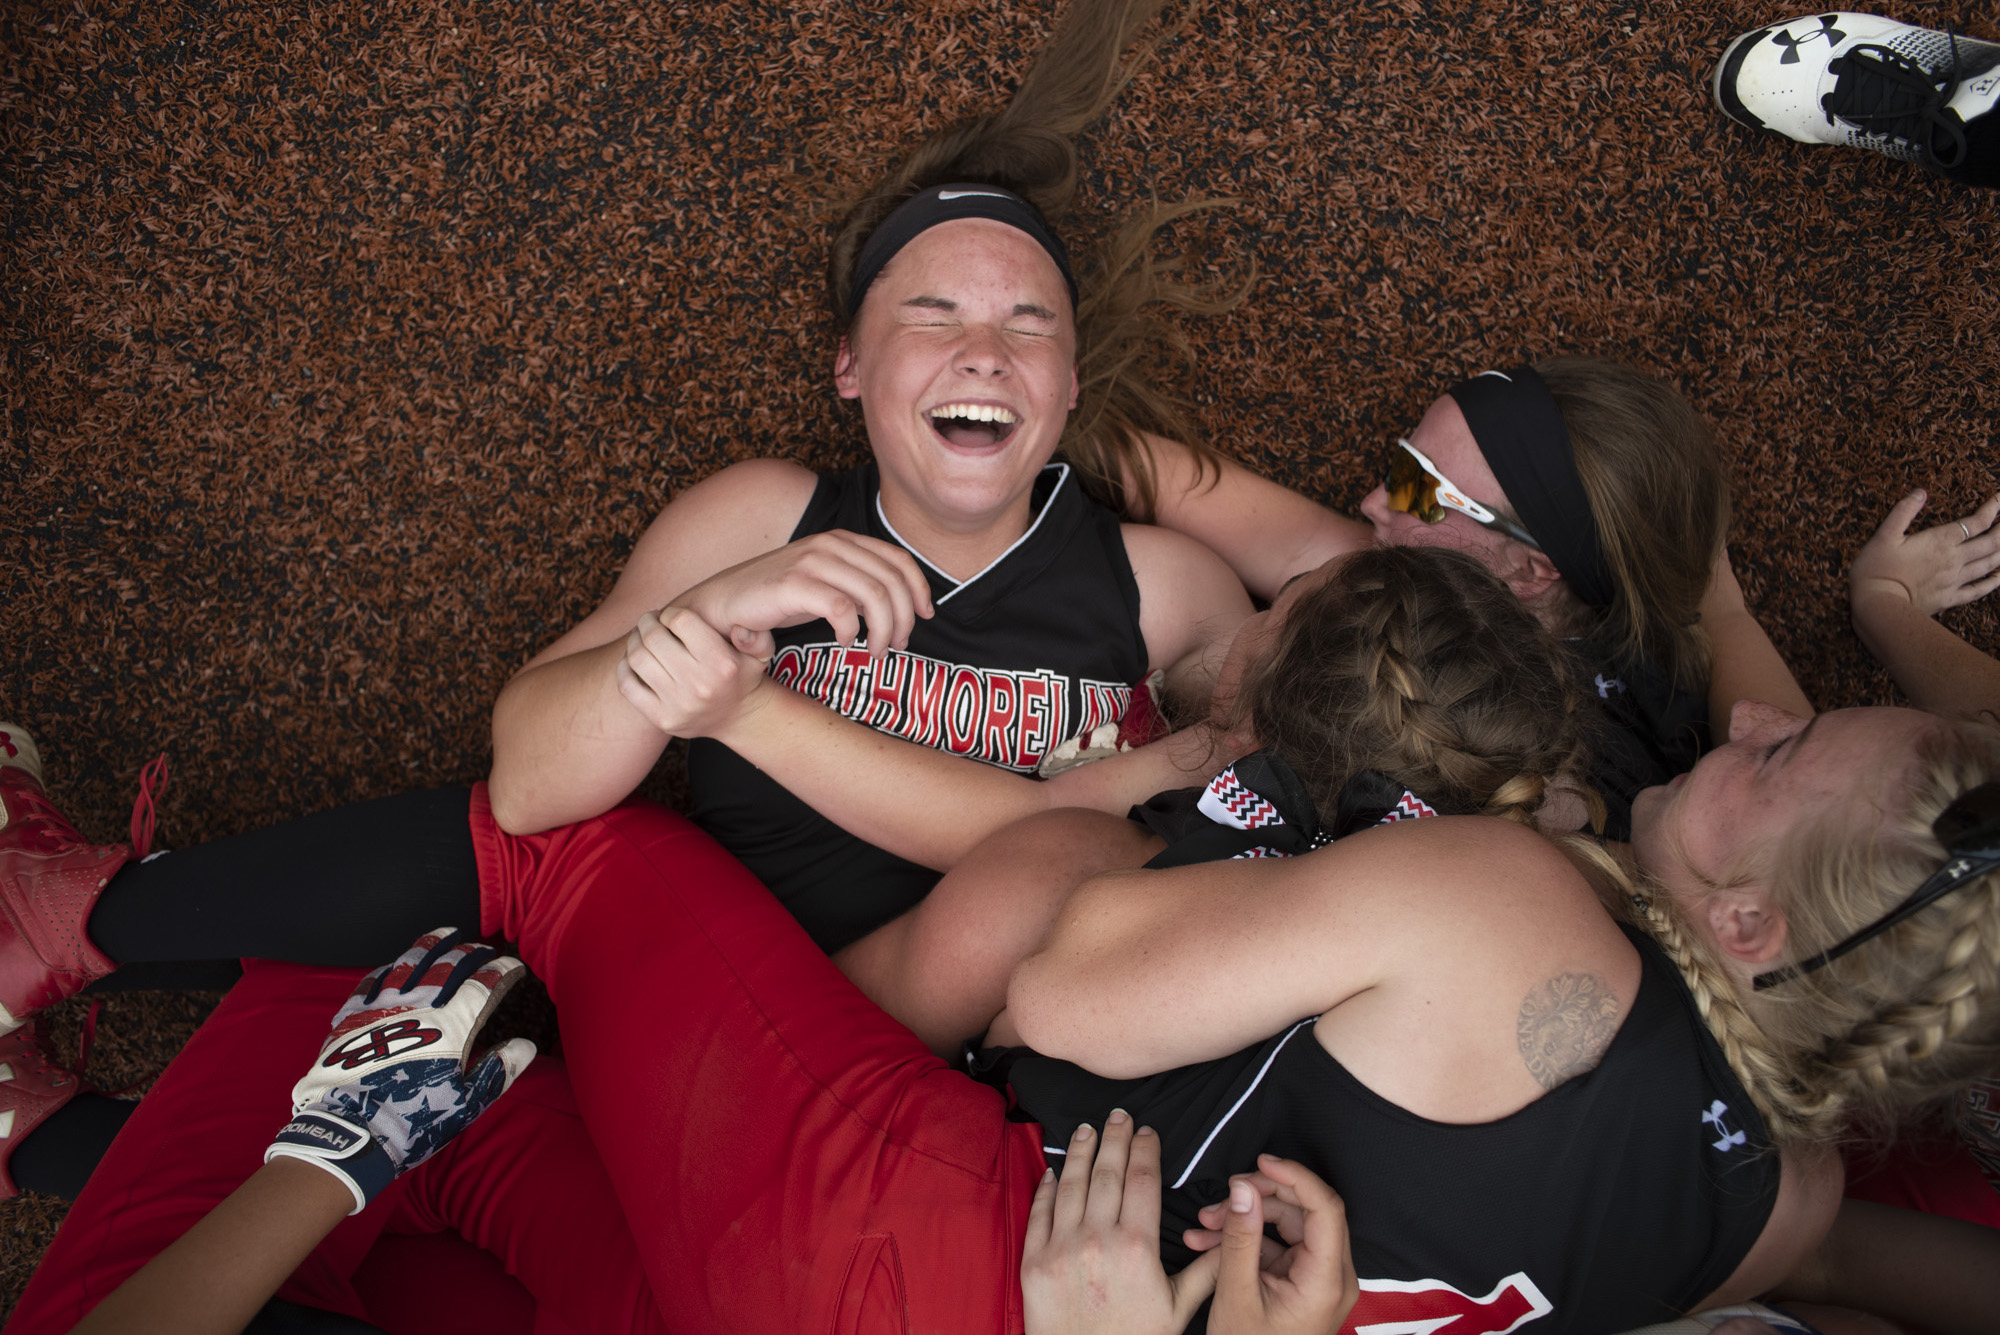 Southmoreland's Varsity Softball team, dog piles on pitcher, Jess Matheny, after the WPIAL softball championship triple on Thursday, May 31, 2018.